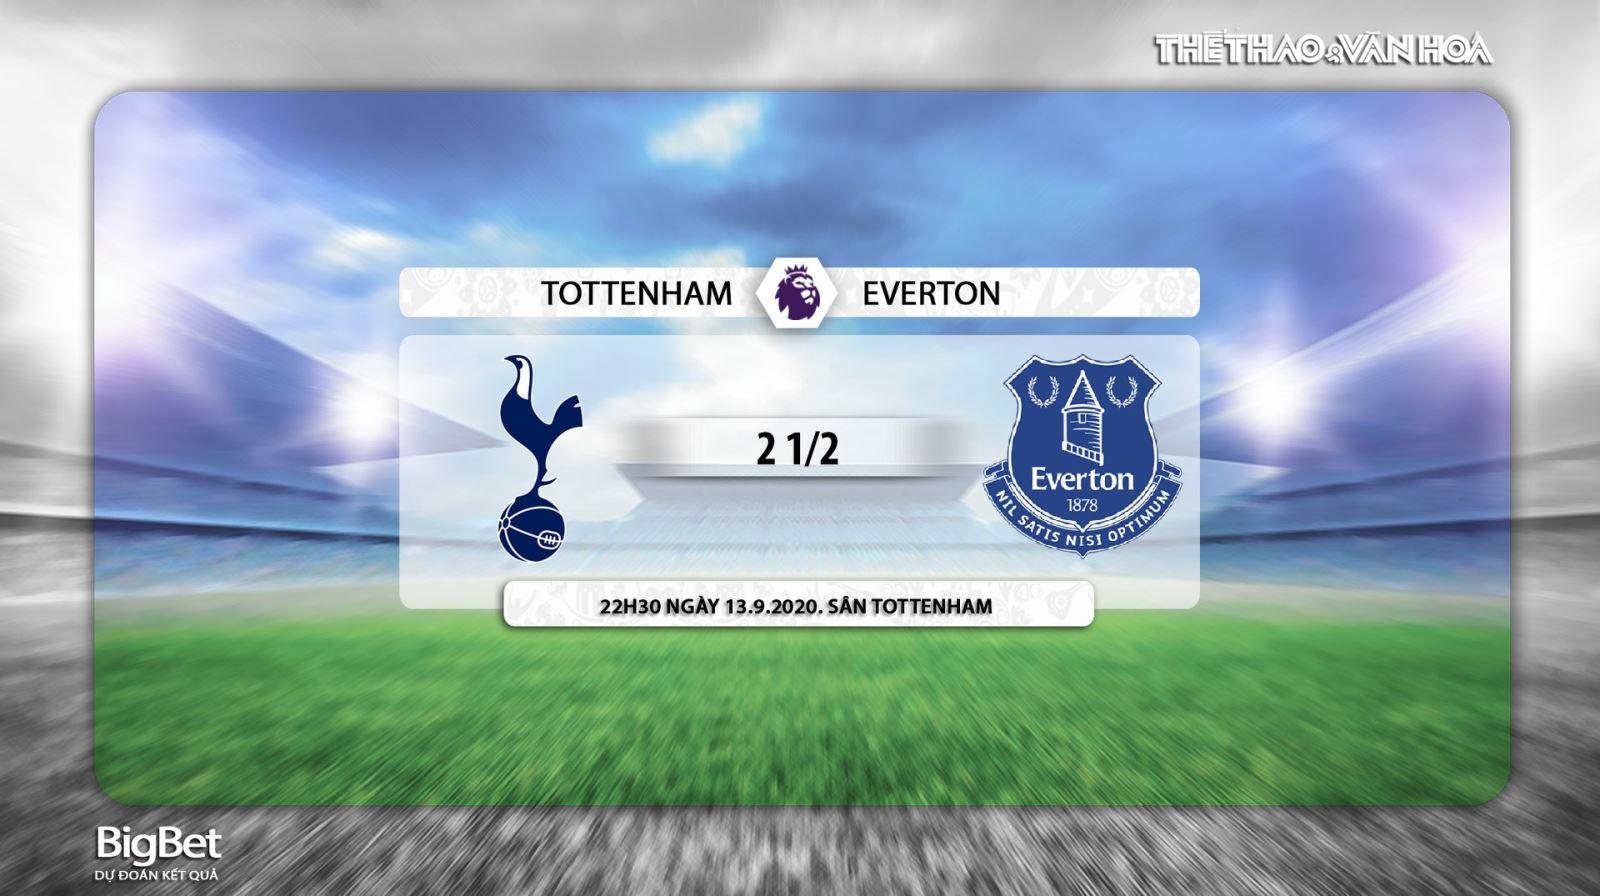 Tottenham vsEverton, Tottenham, Everton, soi kèo, kèo bóng đá, soi kèo Tottenham vsEverton, nhận định, kèo bóng đá